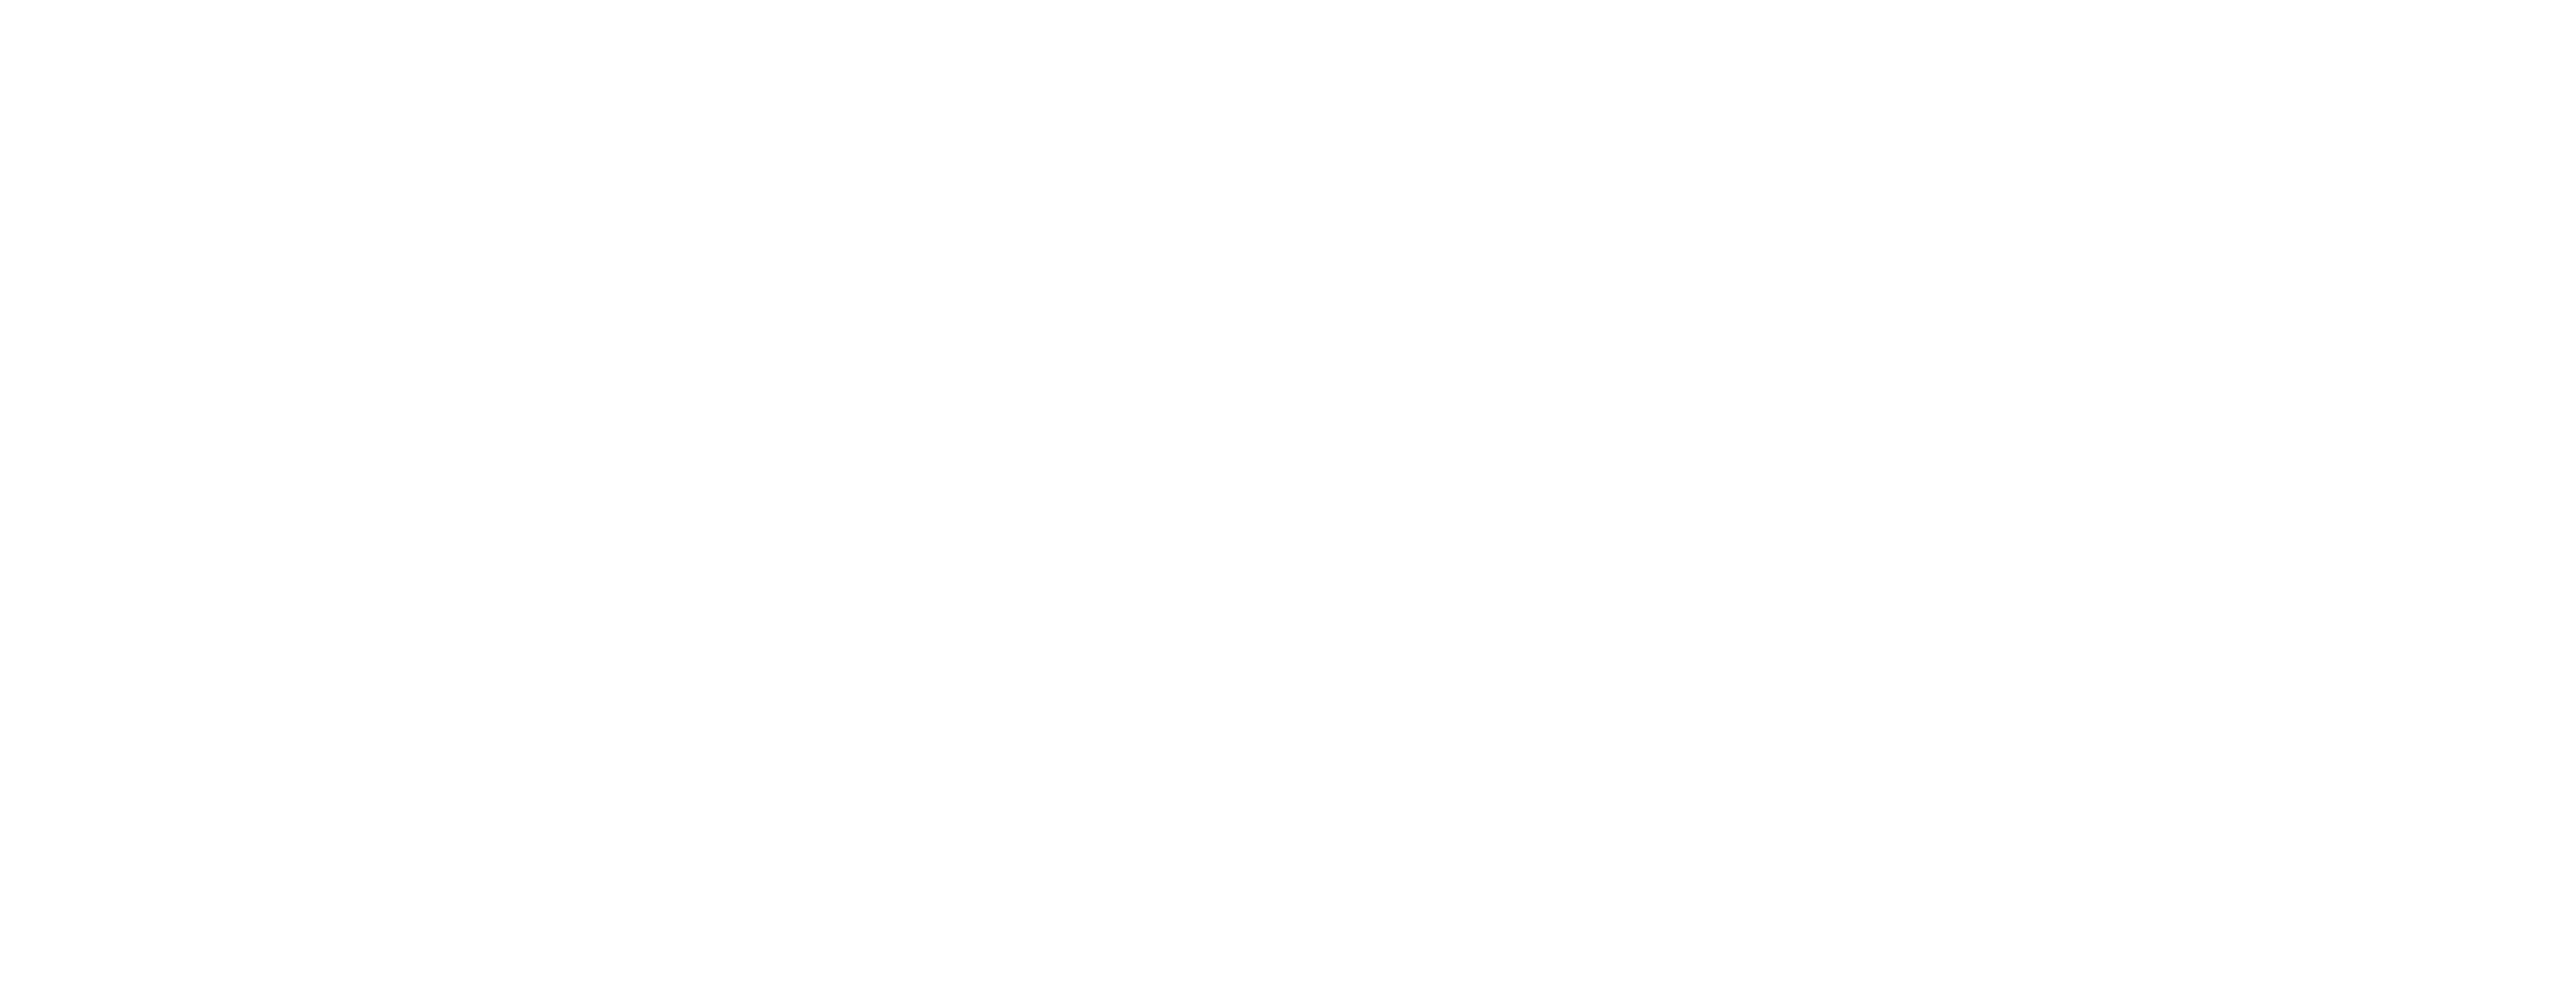 PowerShield-logo_white-transparent-01.png